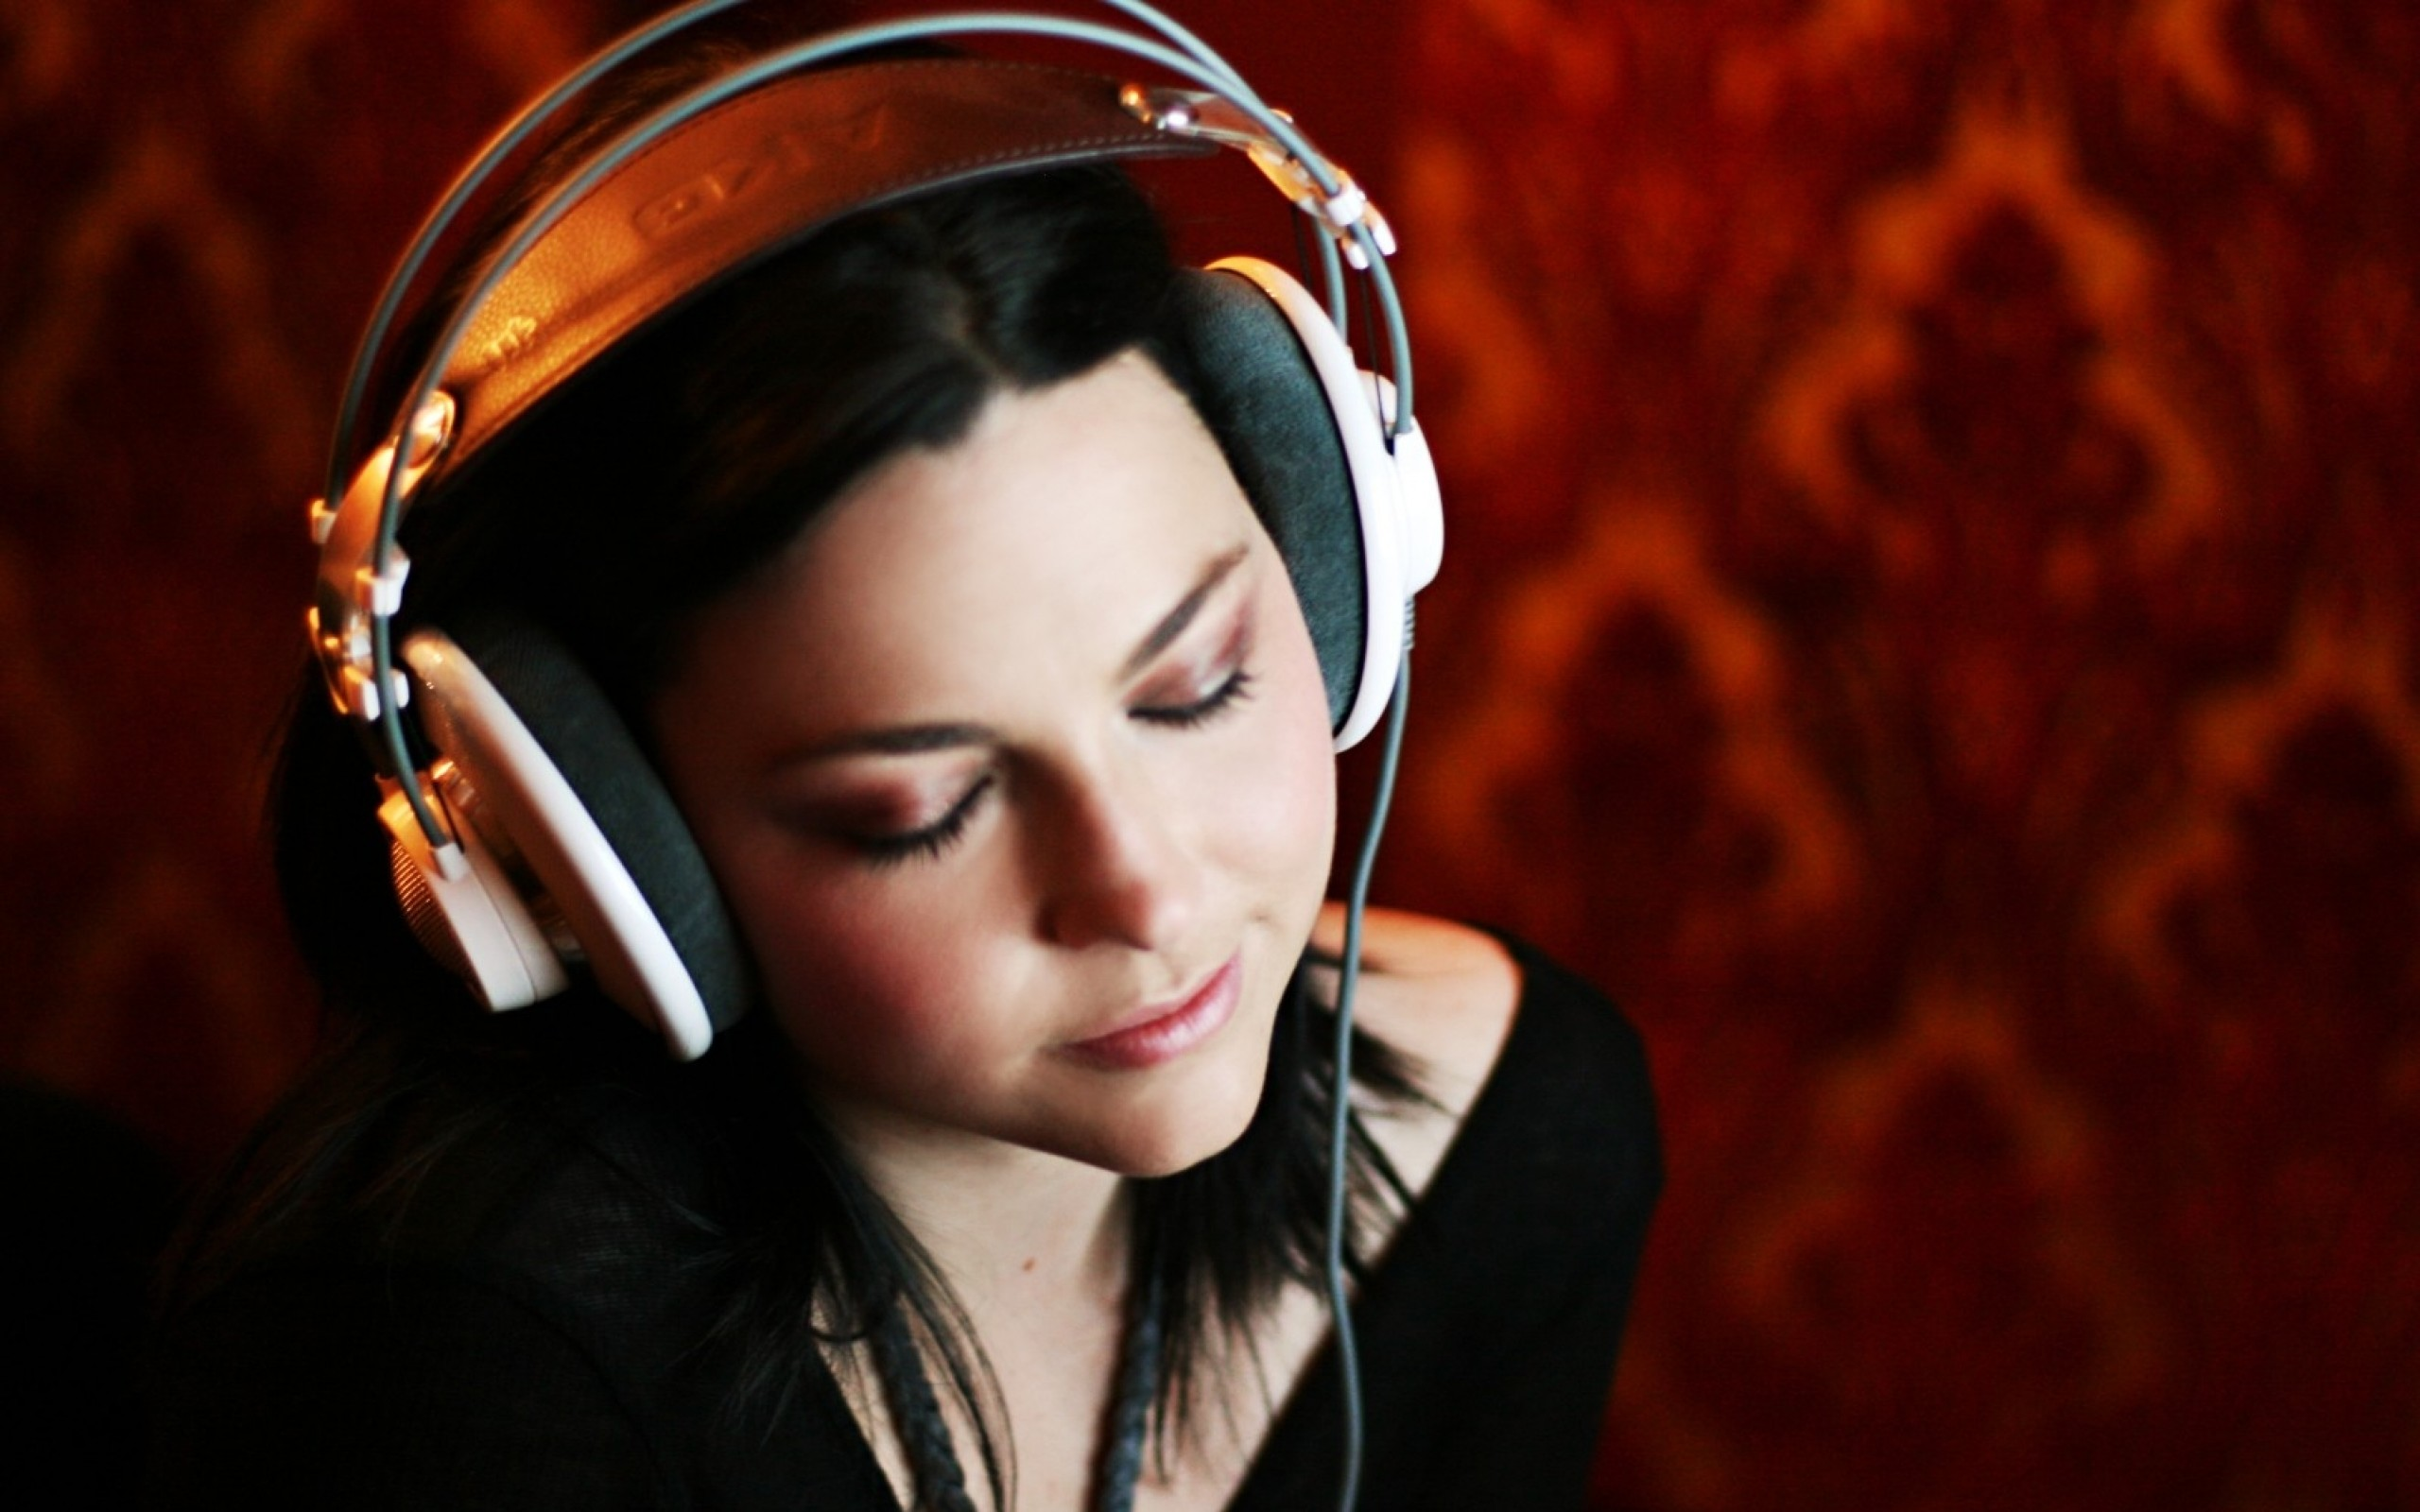 amy lee evanescence headphones girl 1599×1066 wallpaper Art HD Wallpaper